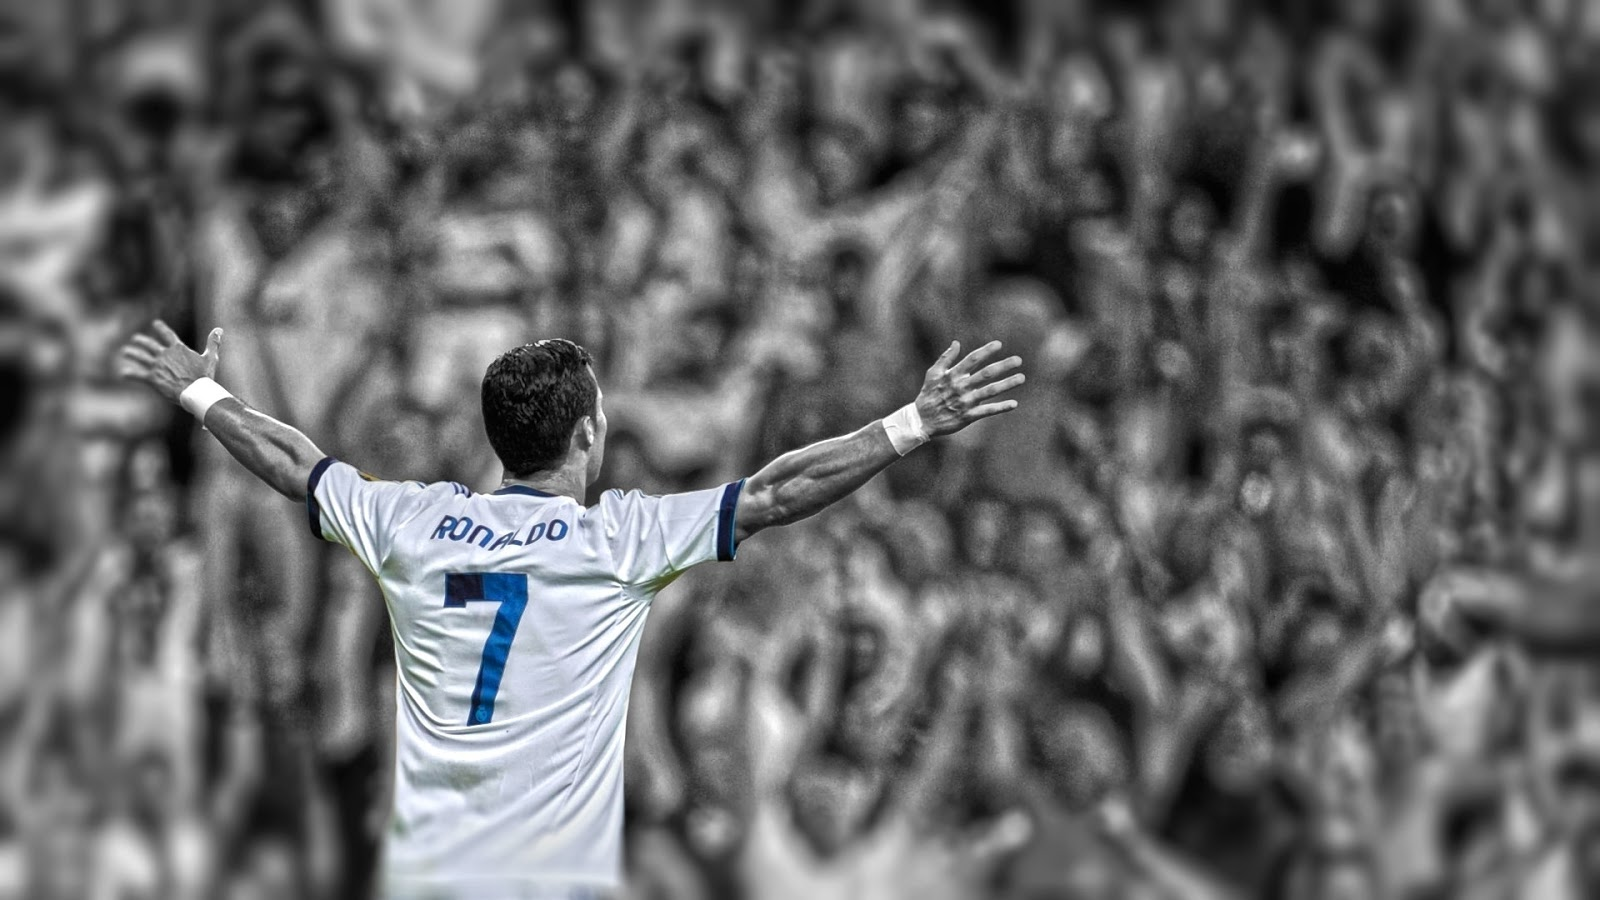 cristiano-ronaldo-no1-football-player